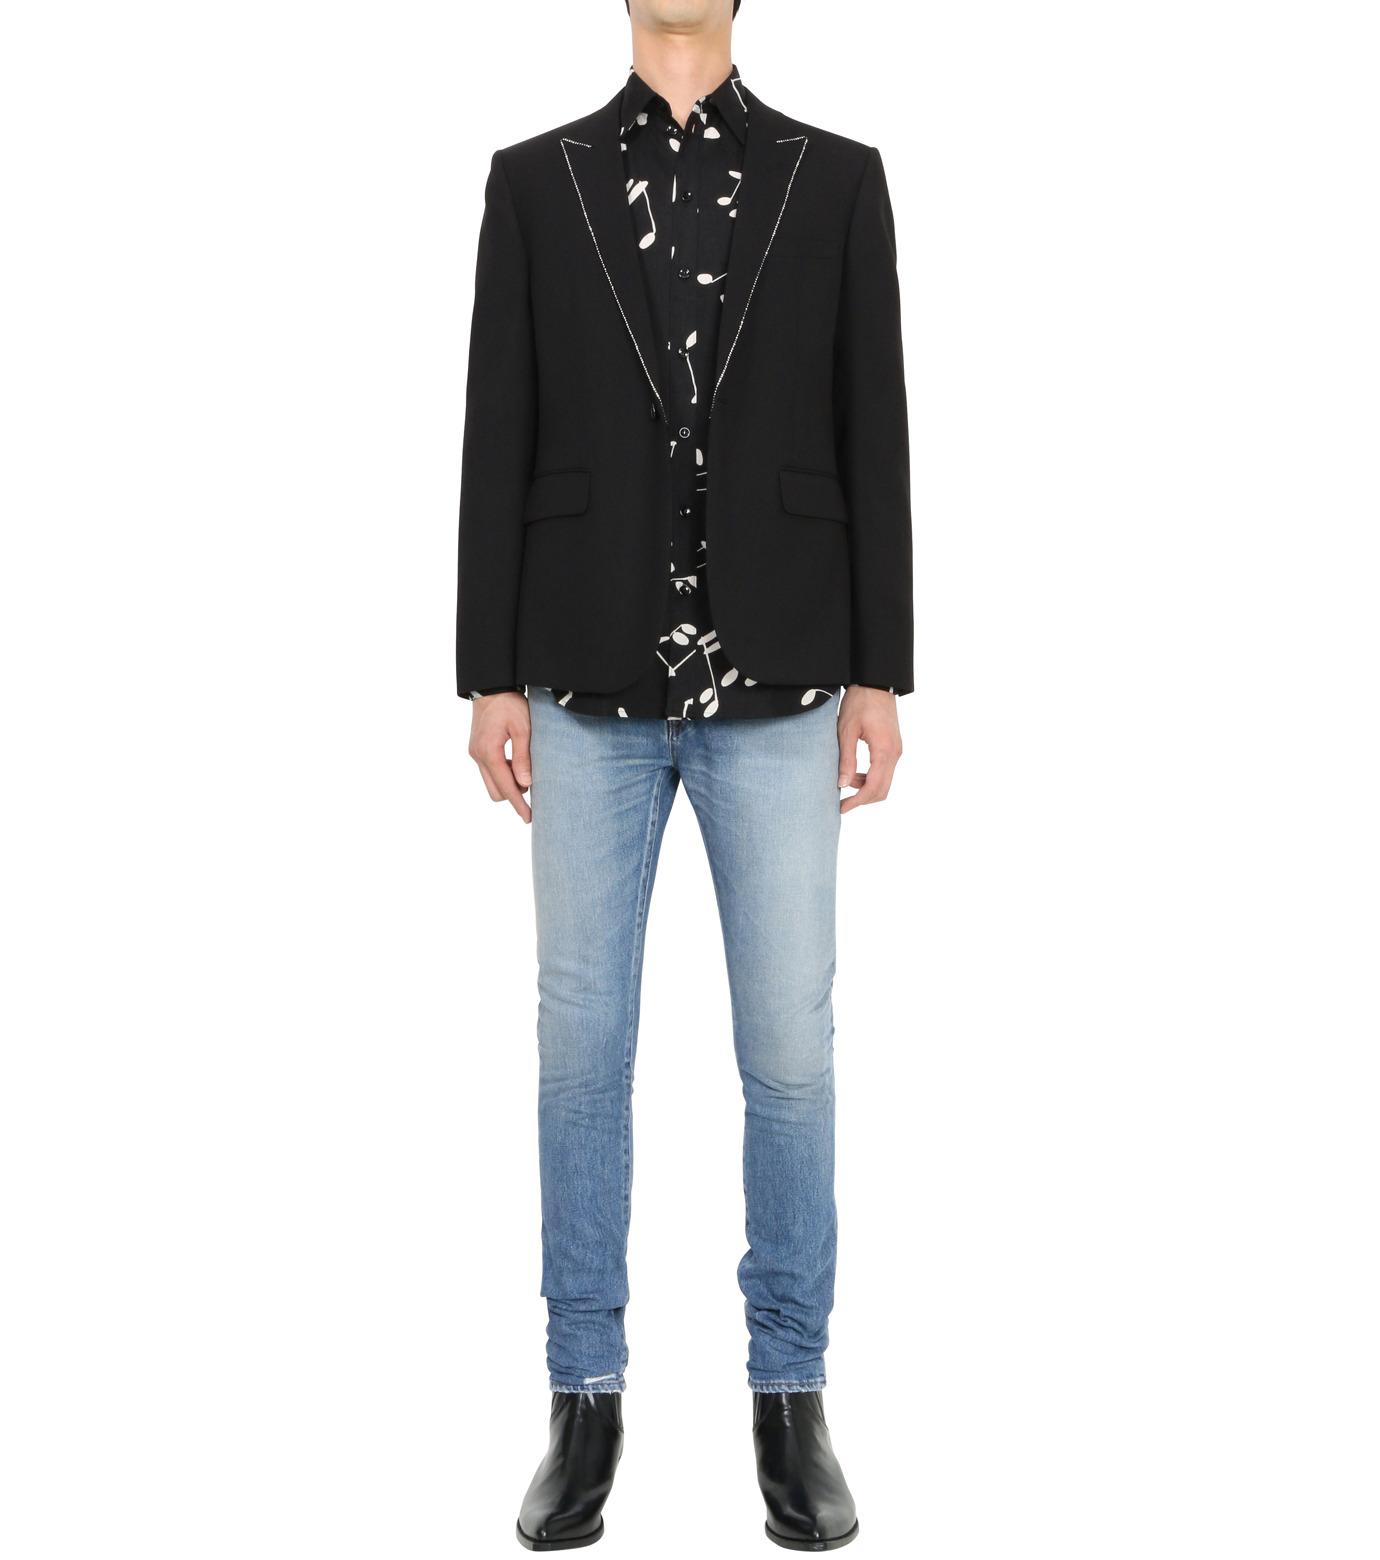 SAINT LAURENT(サンローラン)のStripe Jacket-BLACK(ジャケット/jacket)-394019-Y239W-13 拡大詳細画像3